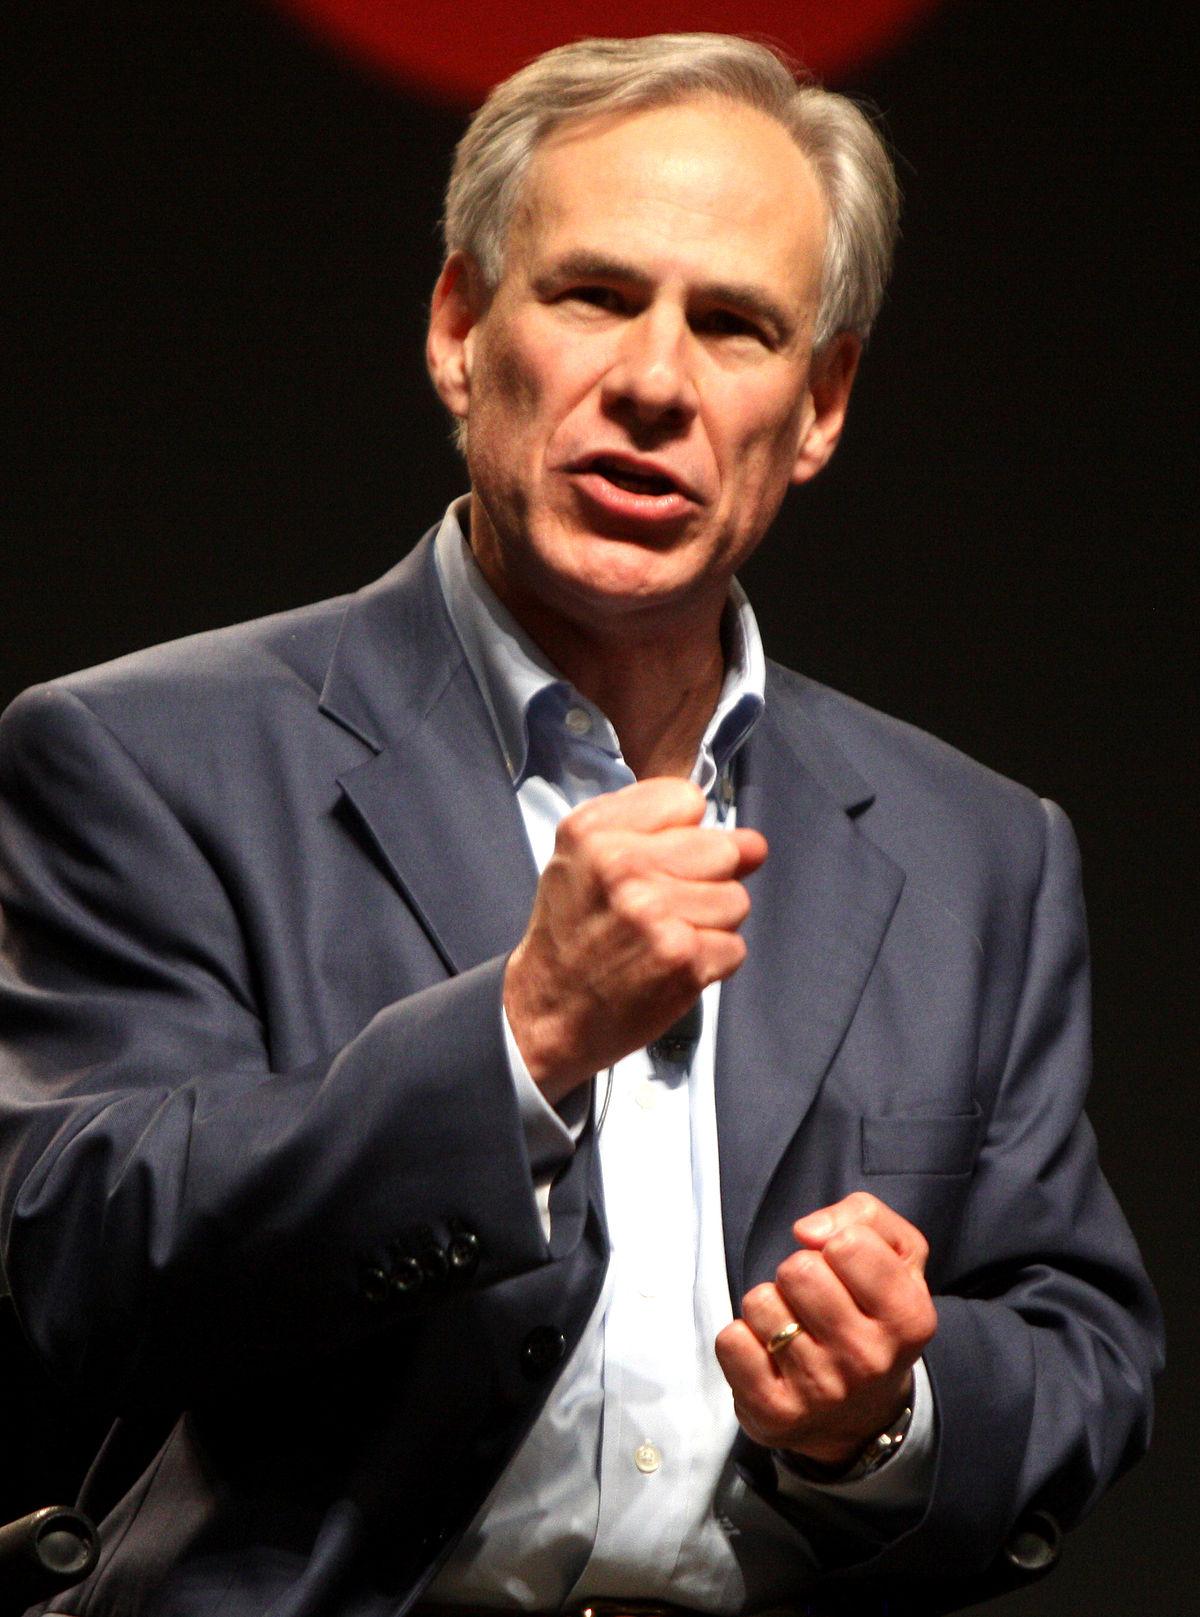 Greg Abbott Wikipedia